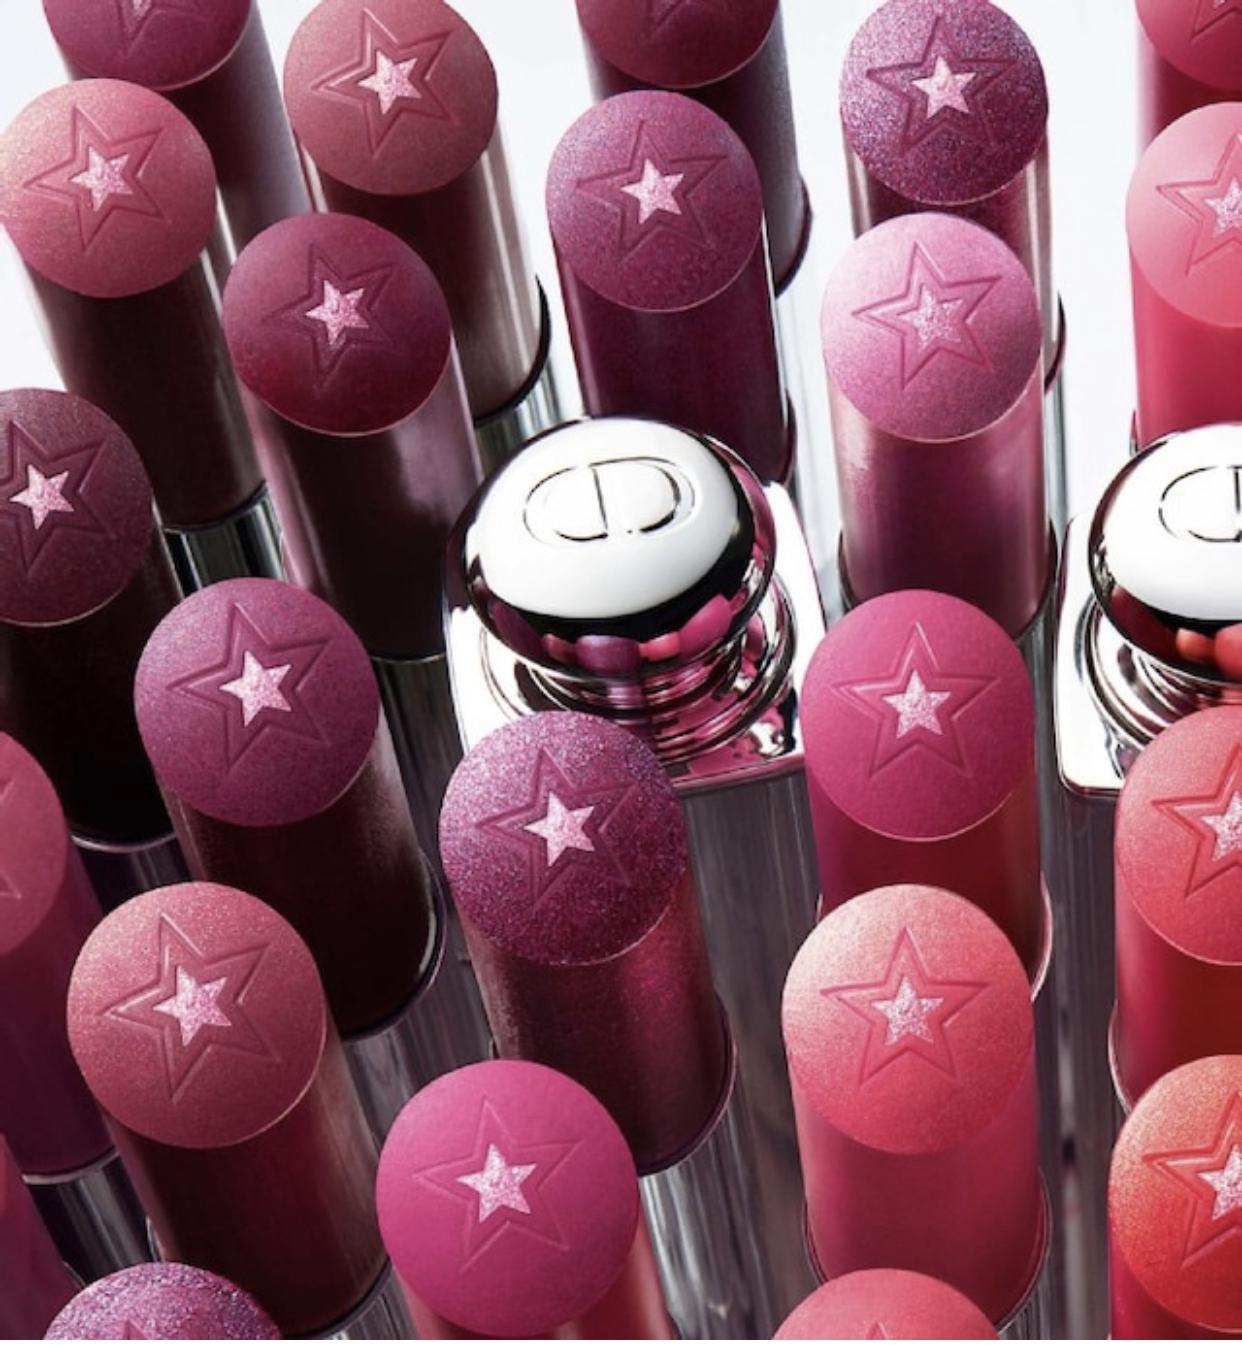 DIOR Addict Stellar Halo Shine Lipstick Collection